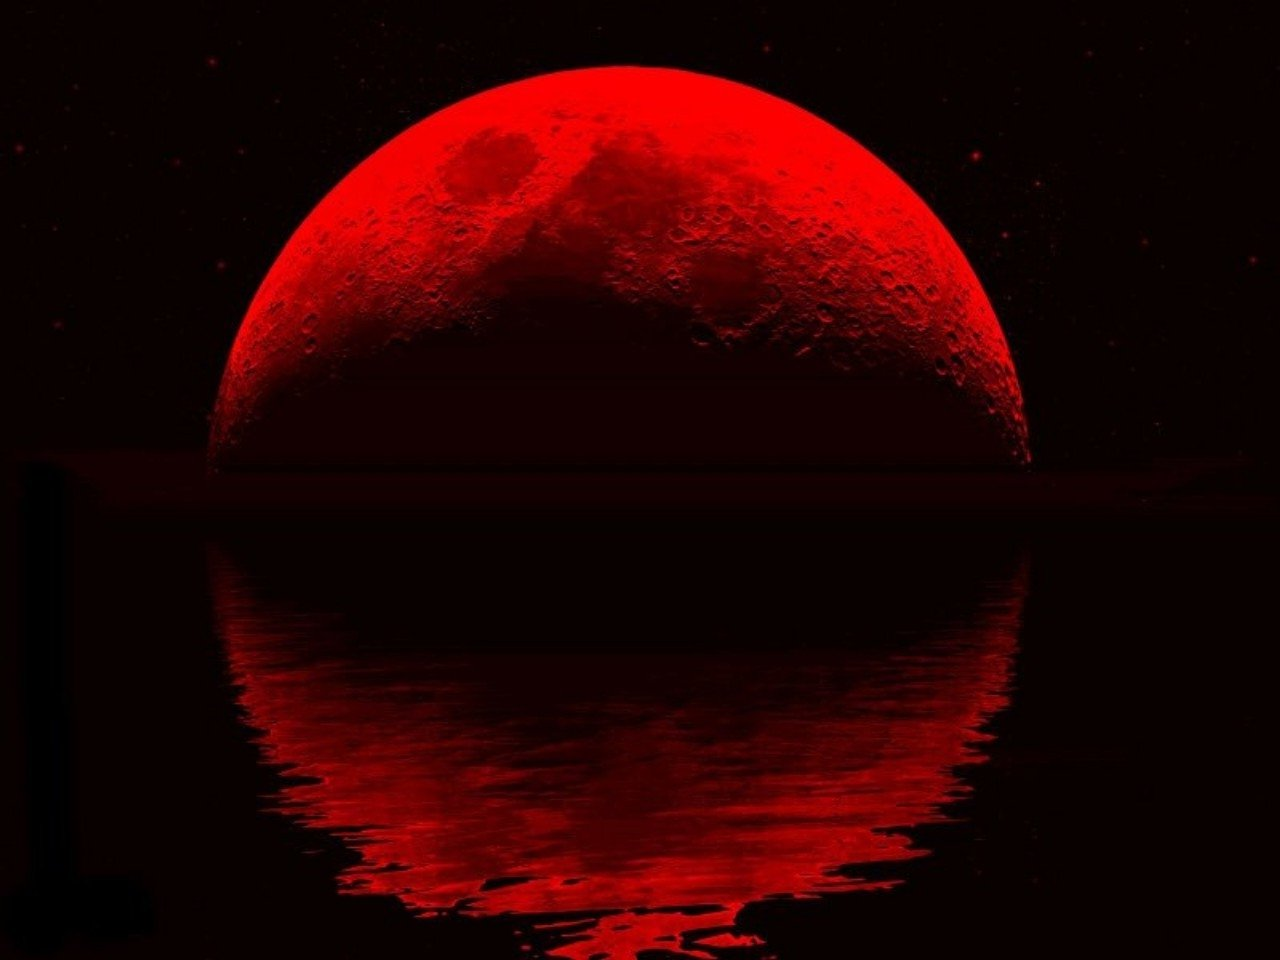 red moon inc - photo #2